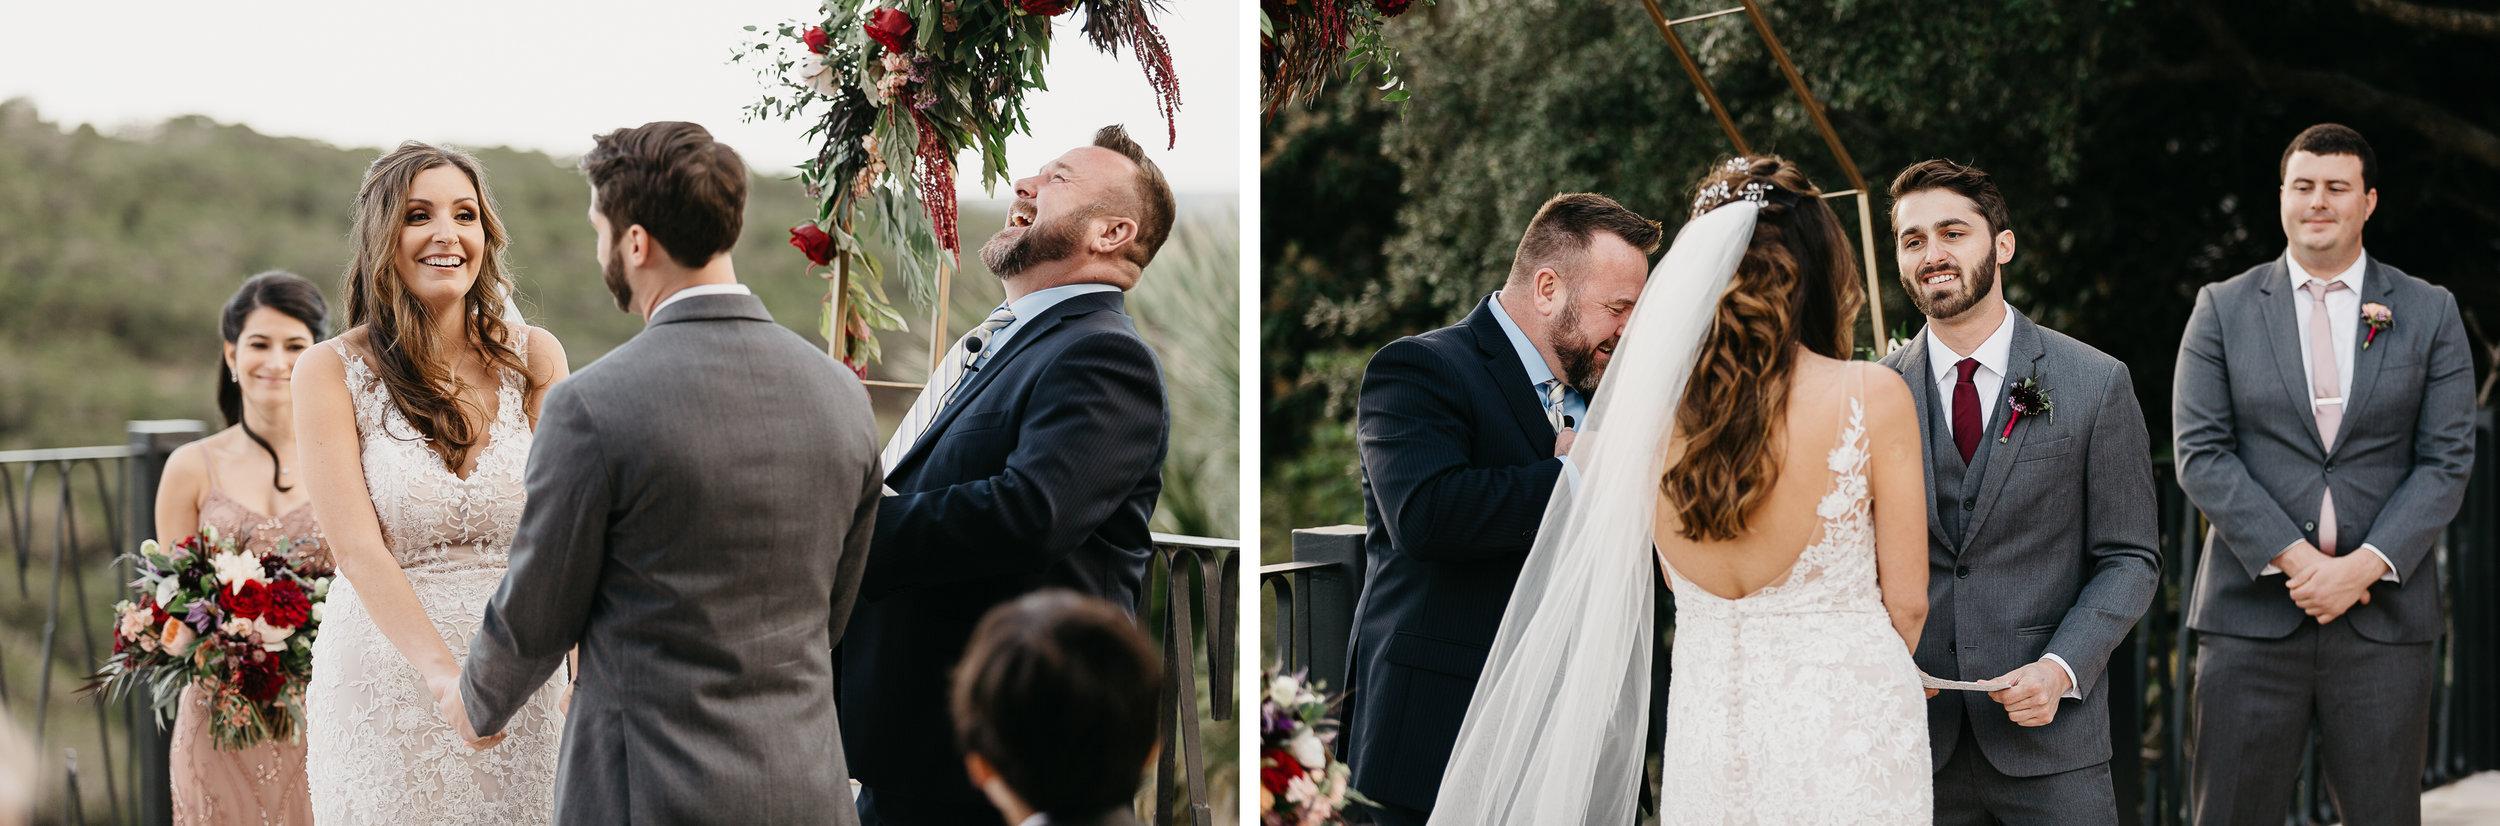 austin texas wedding photogapher elopement photographer villa antonia austin 24.jpg